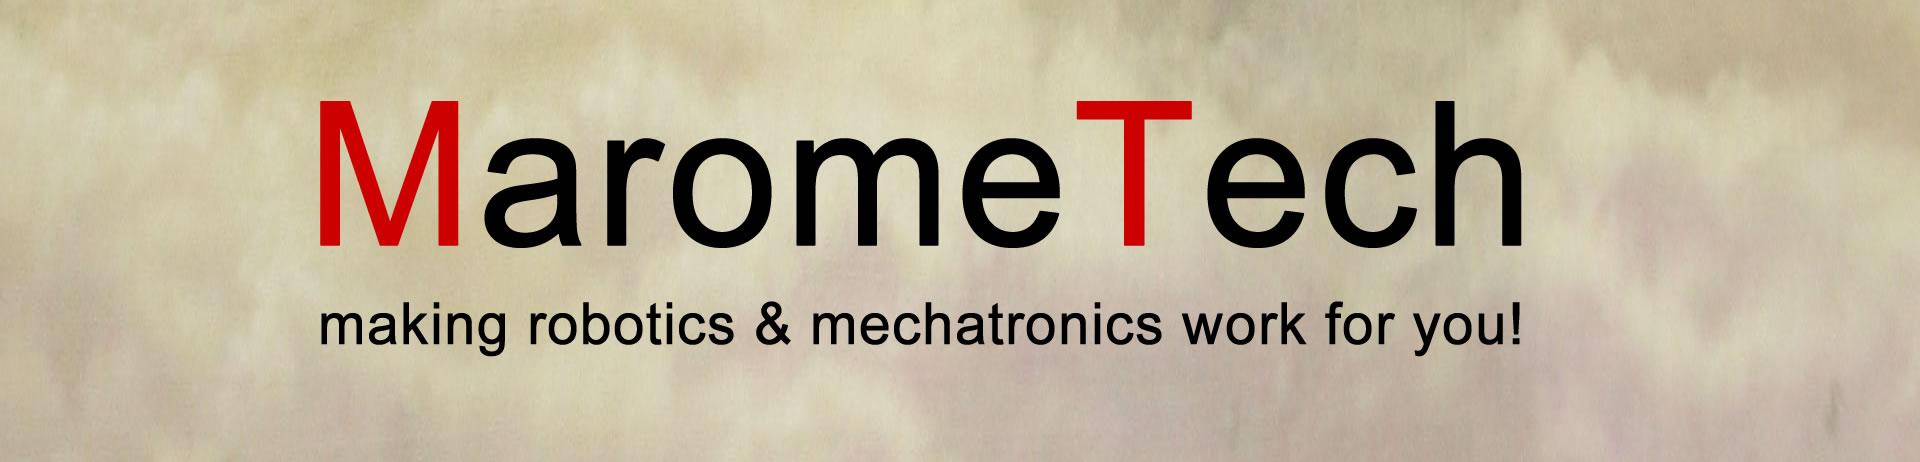 MaromeTech